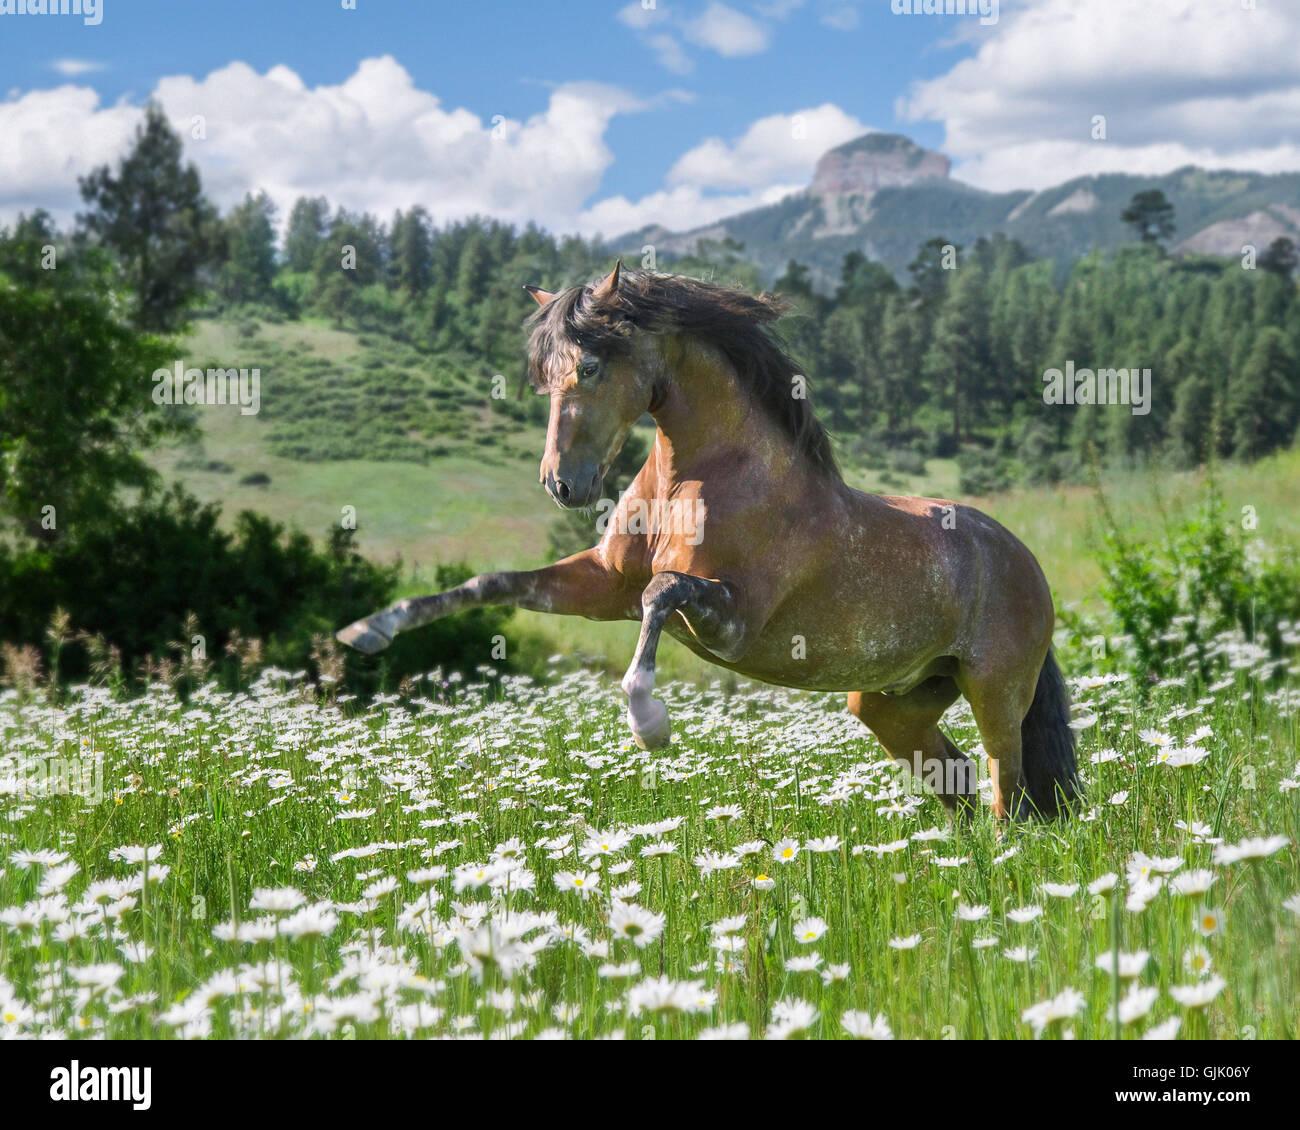 Caballo semental levanta en wildflower meadow. Imagen De Stock